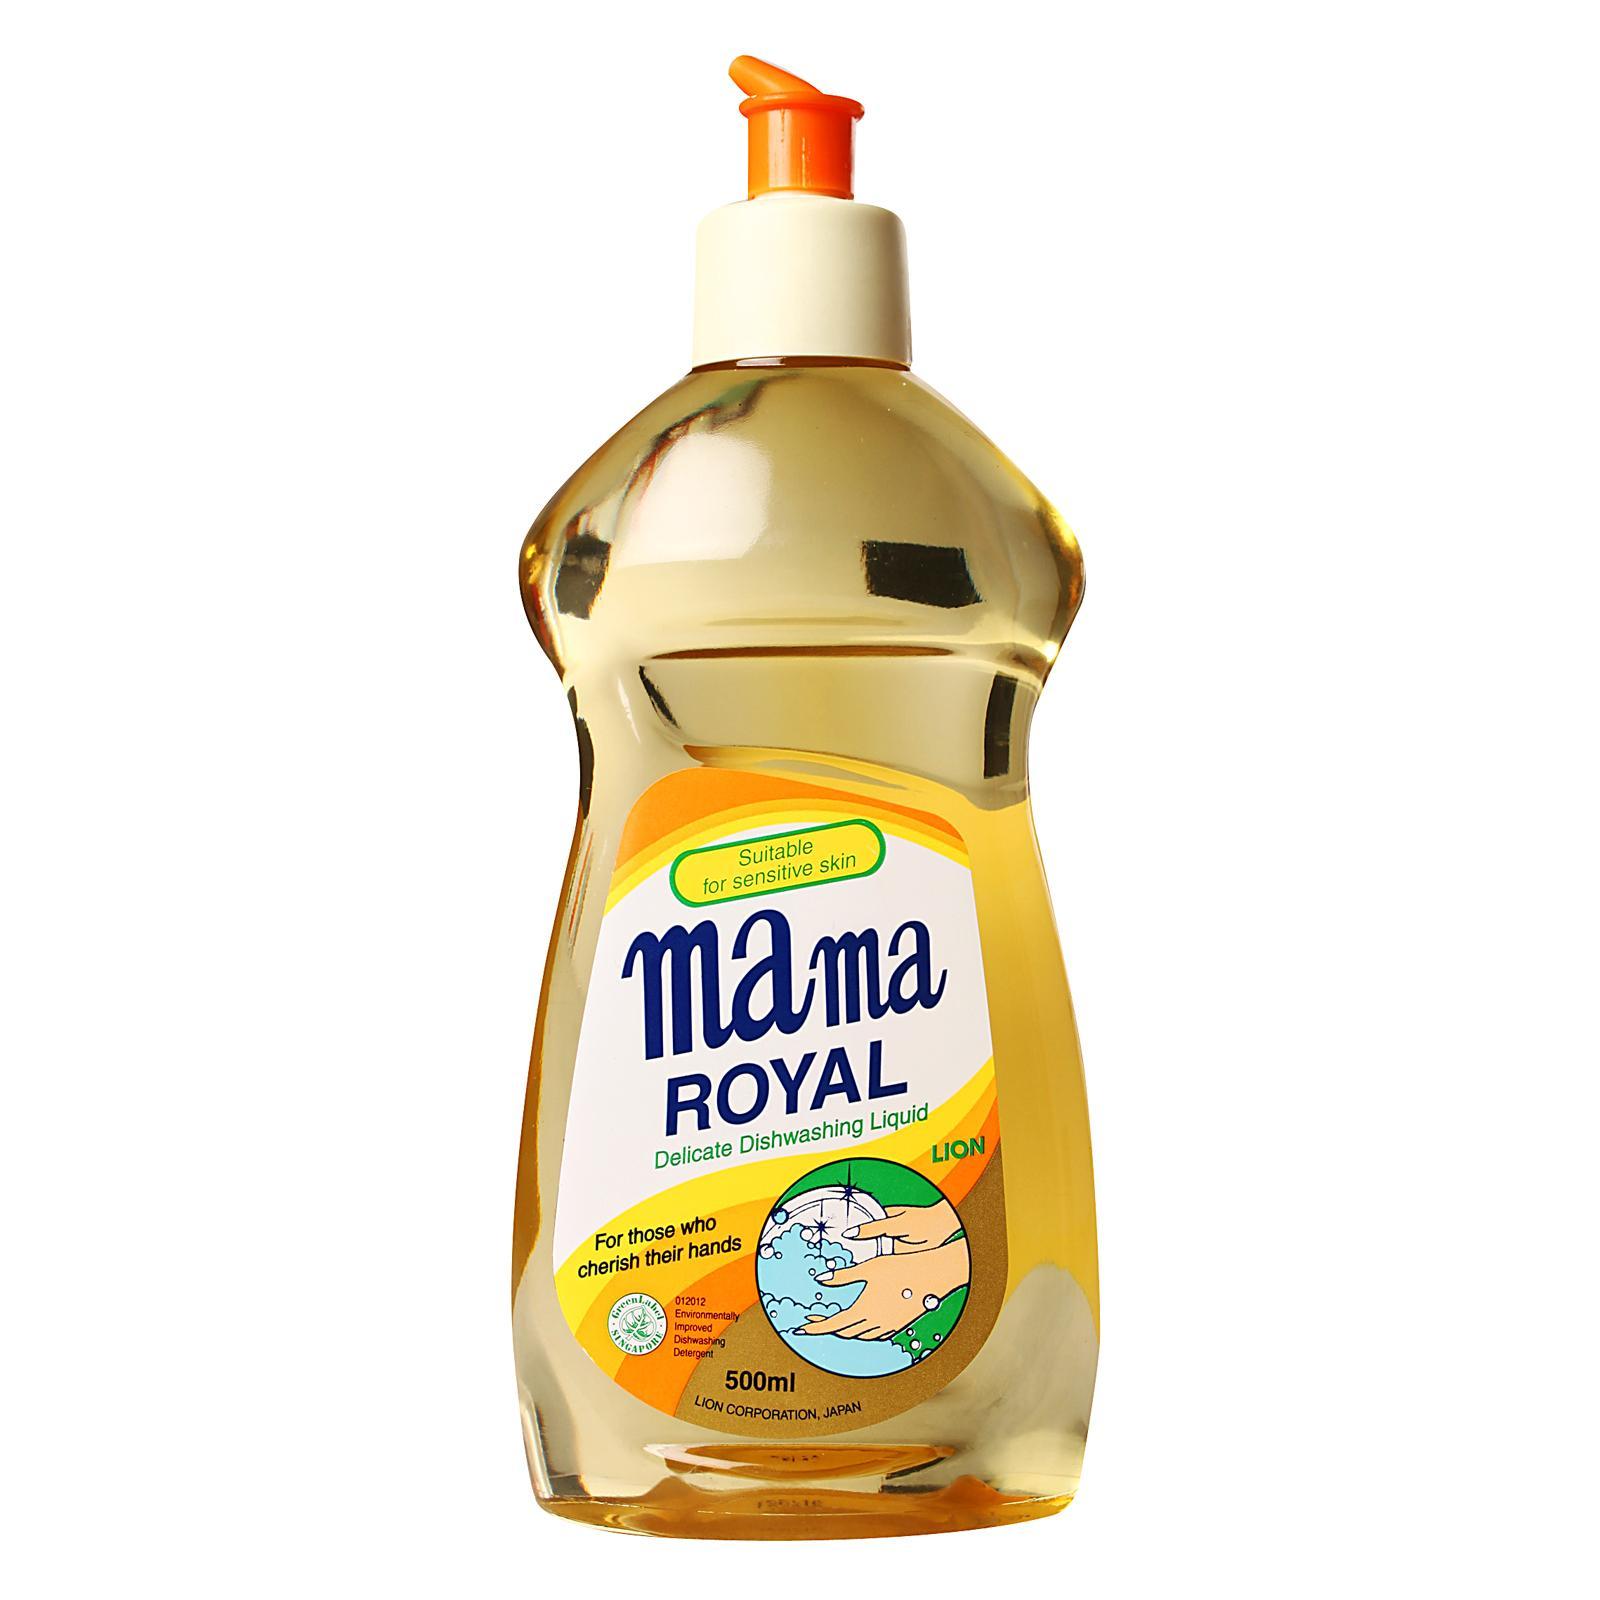 MAMA Dishwashing Liquid Royal Delicate 500ml